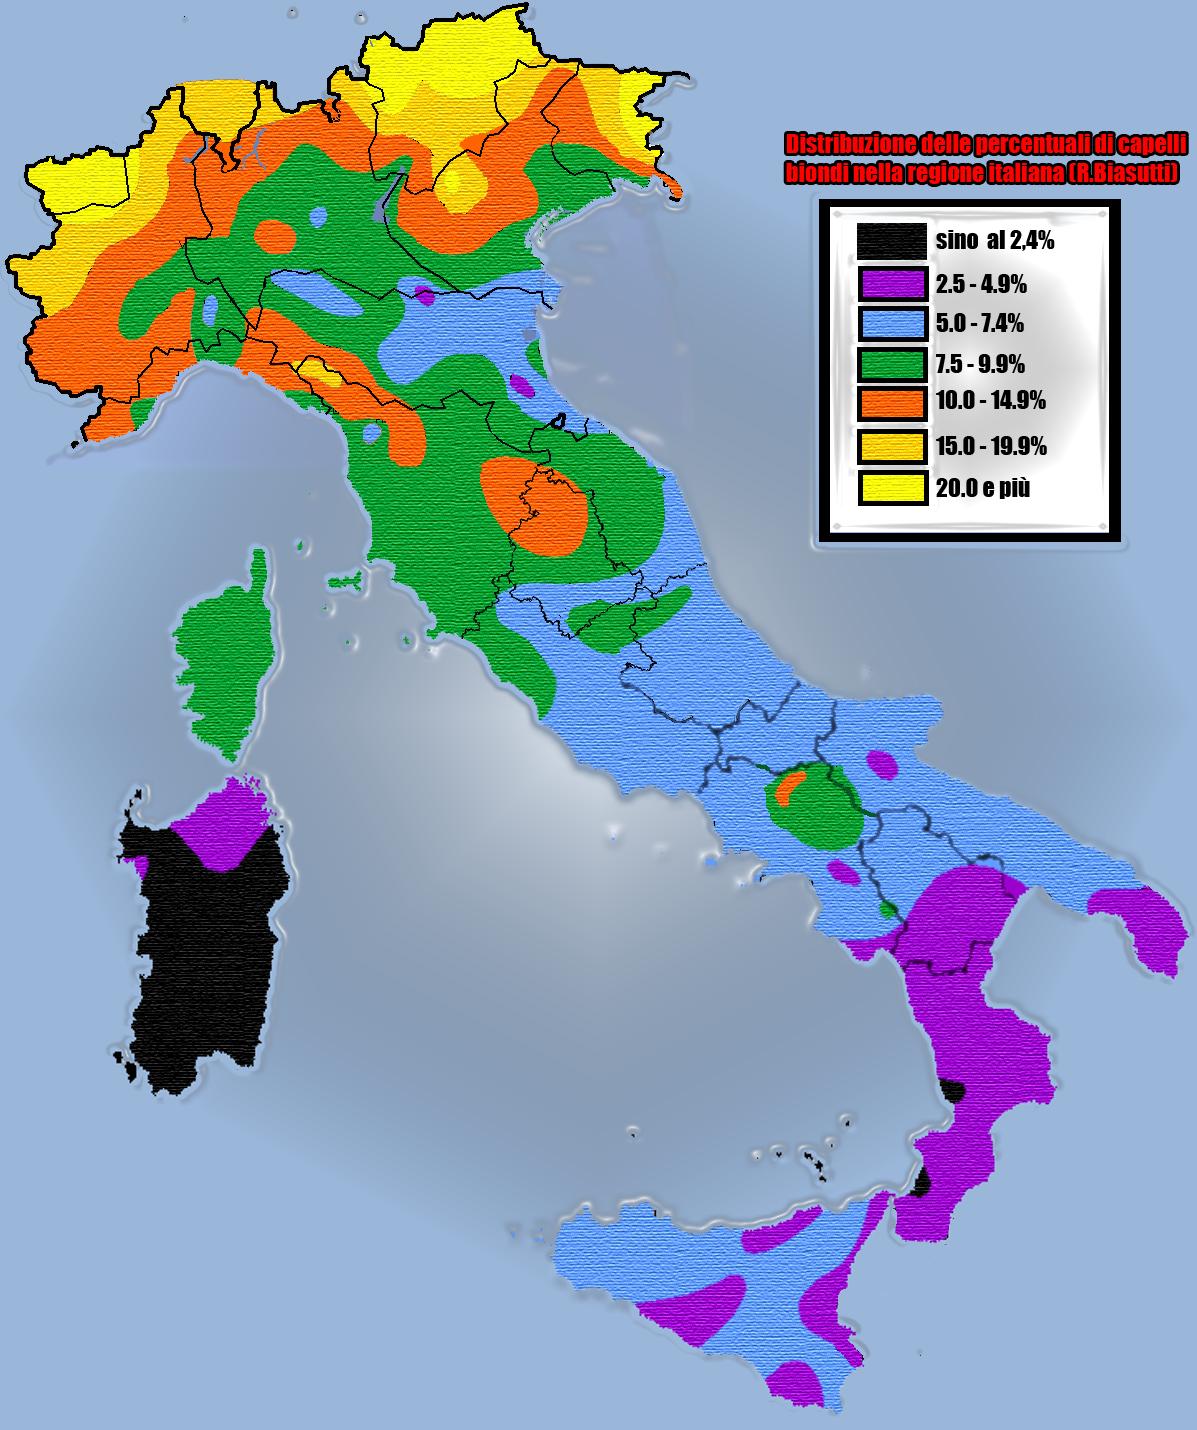 J U V E N T U S Y Haplogroup Rb And Light Hair In Italy - Juventus italy map